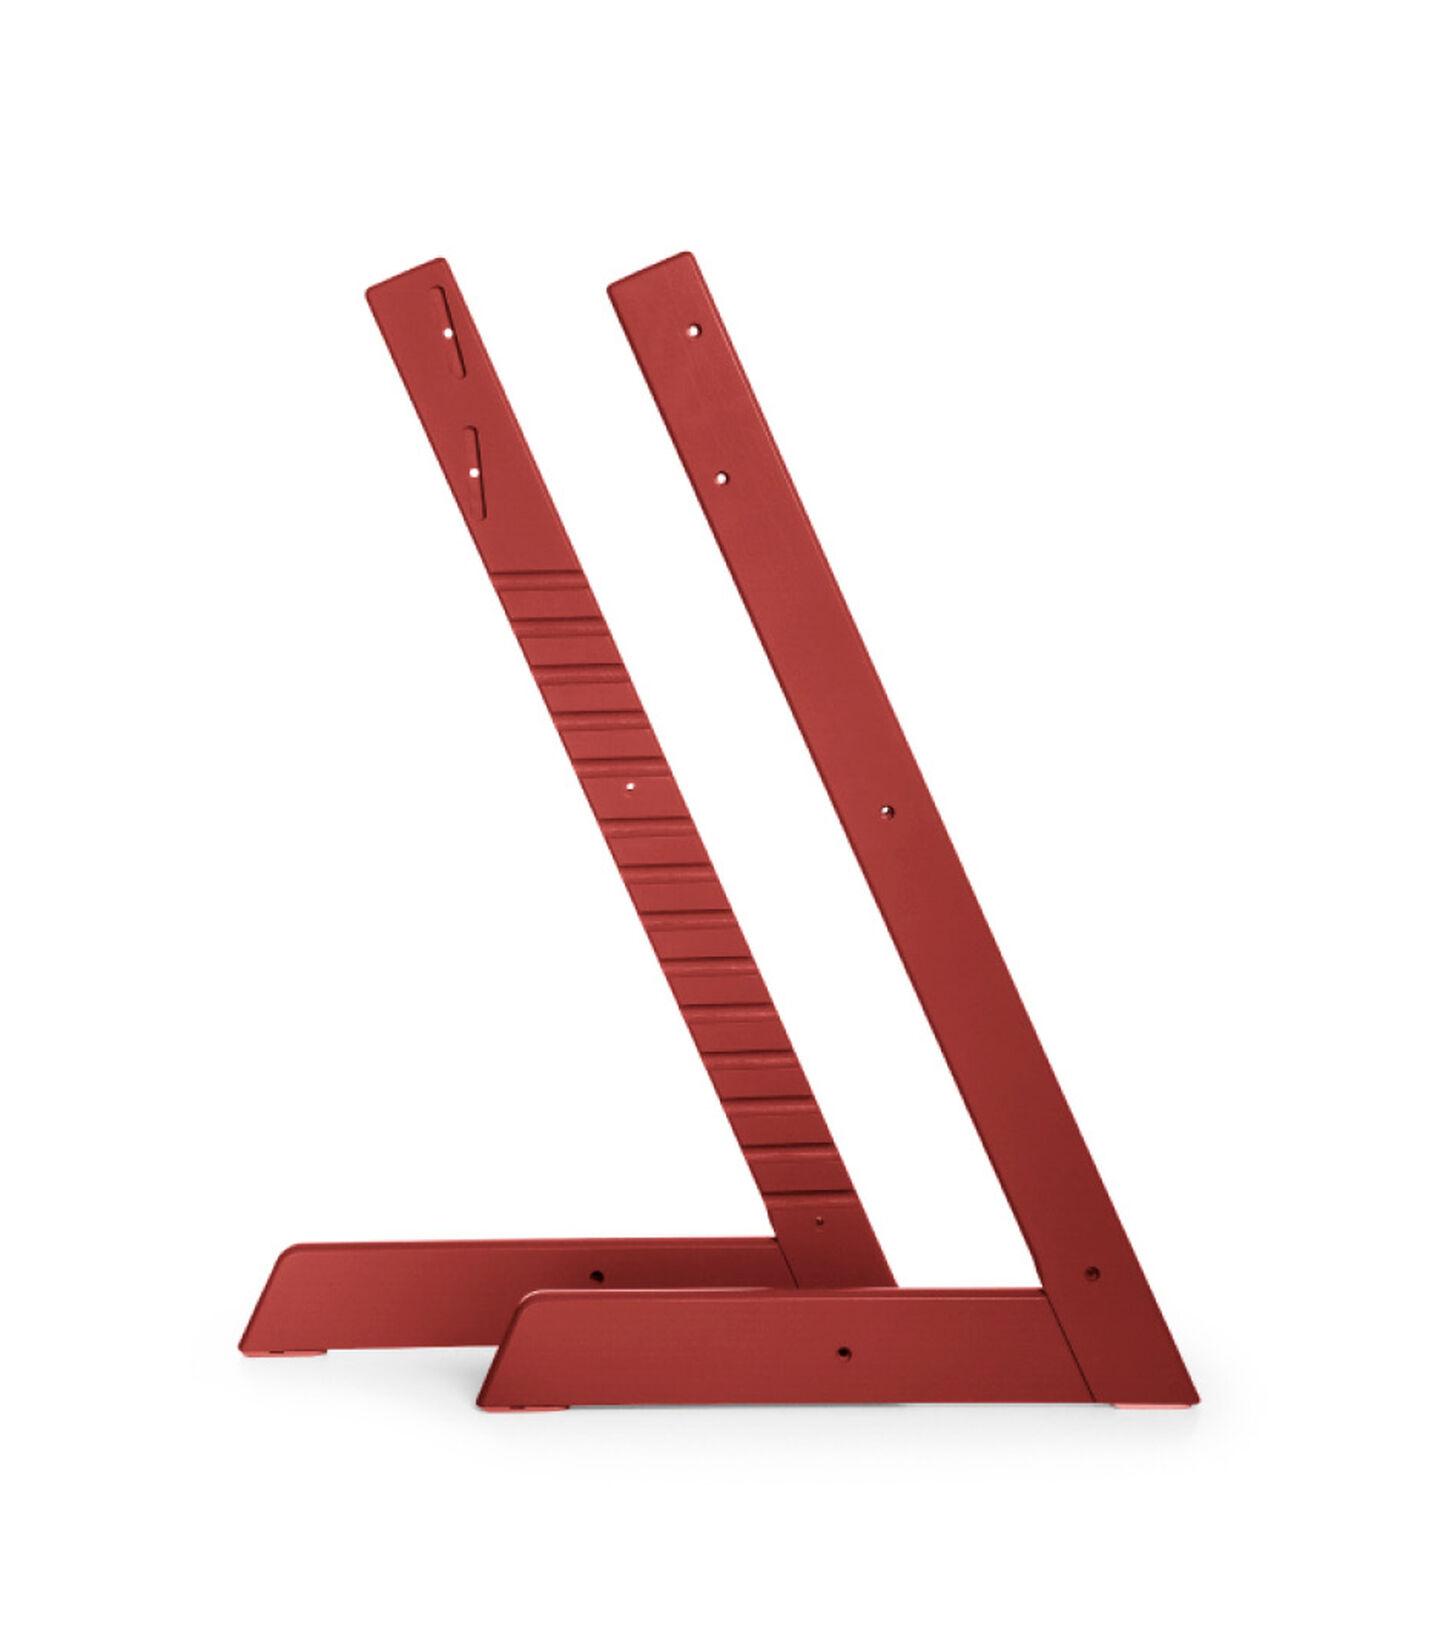 Tripp Trapp® Siderunner Rojo cálido, Rojo cálido, mainview view 2